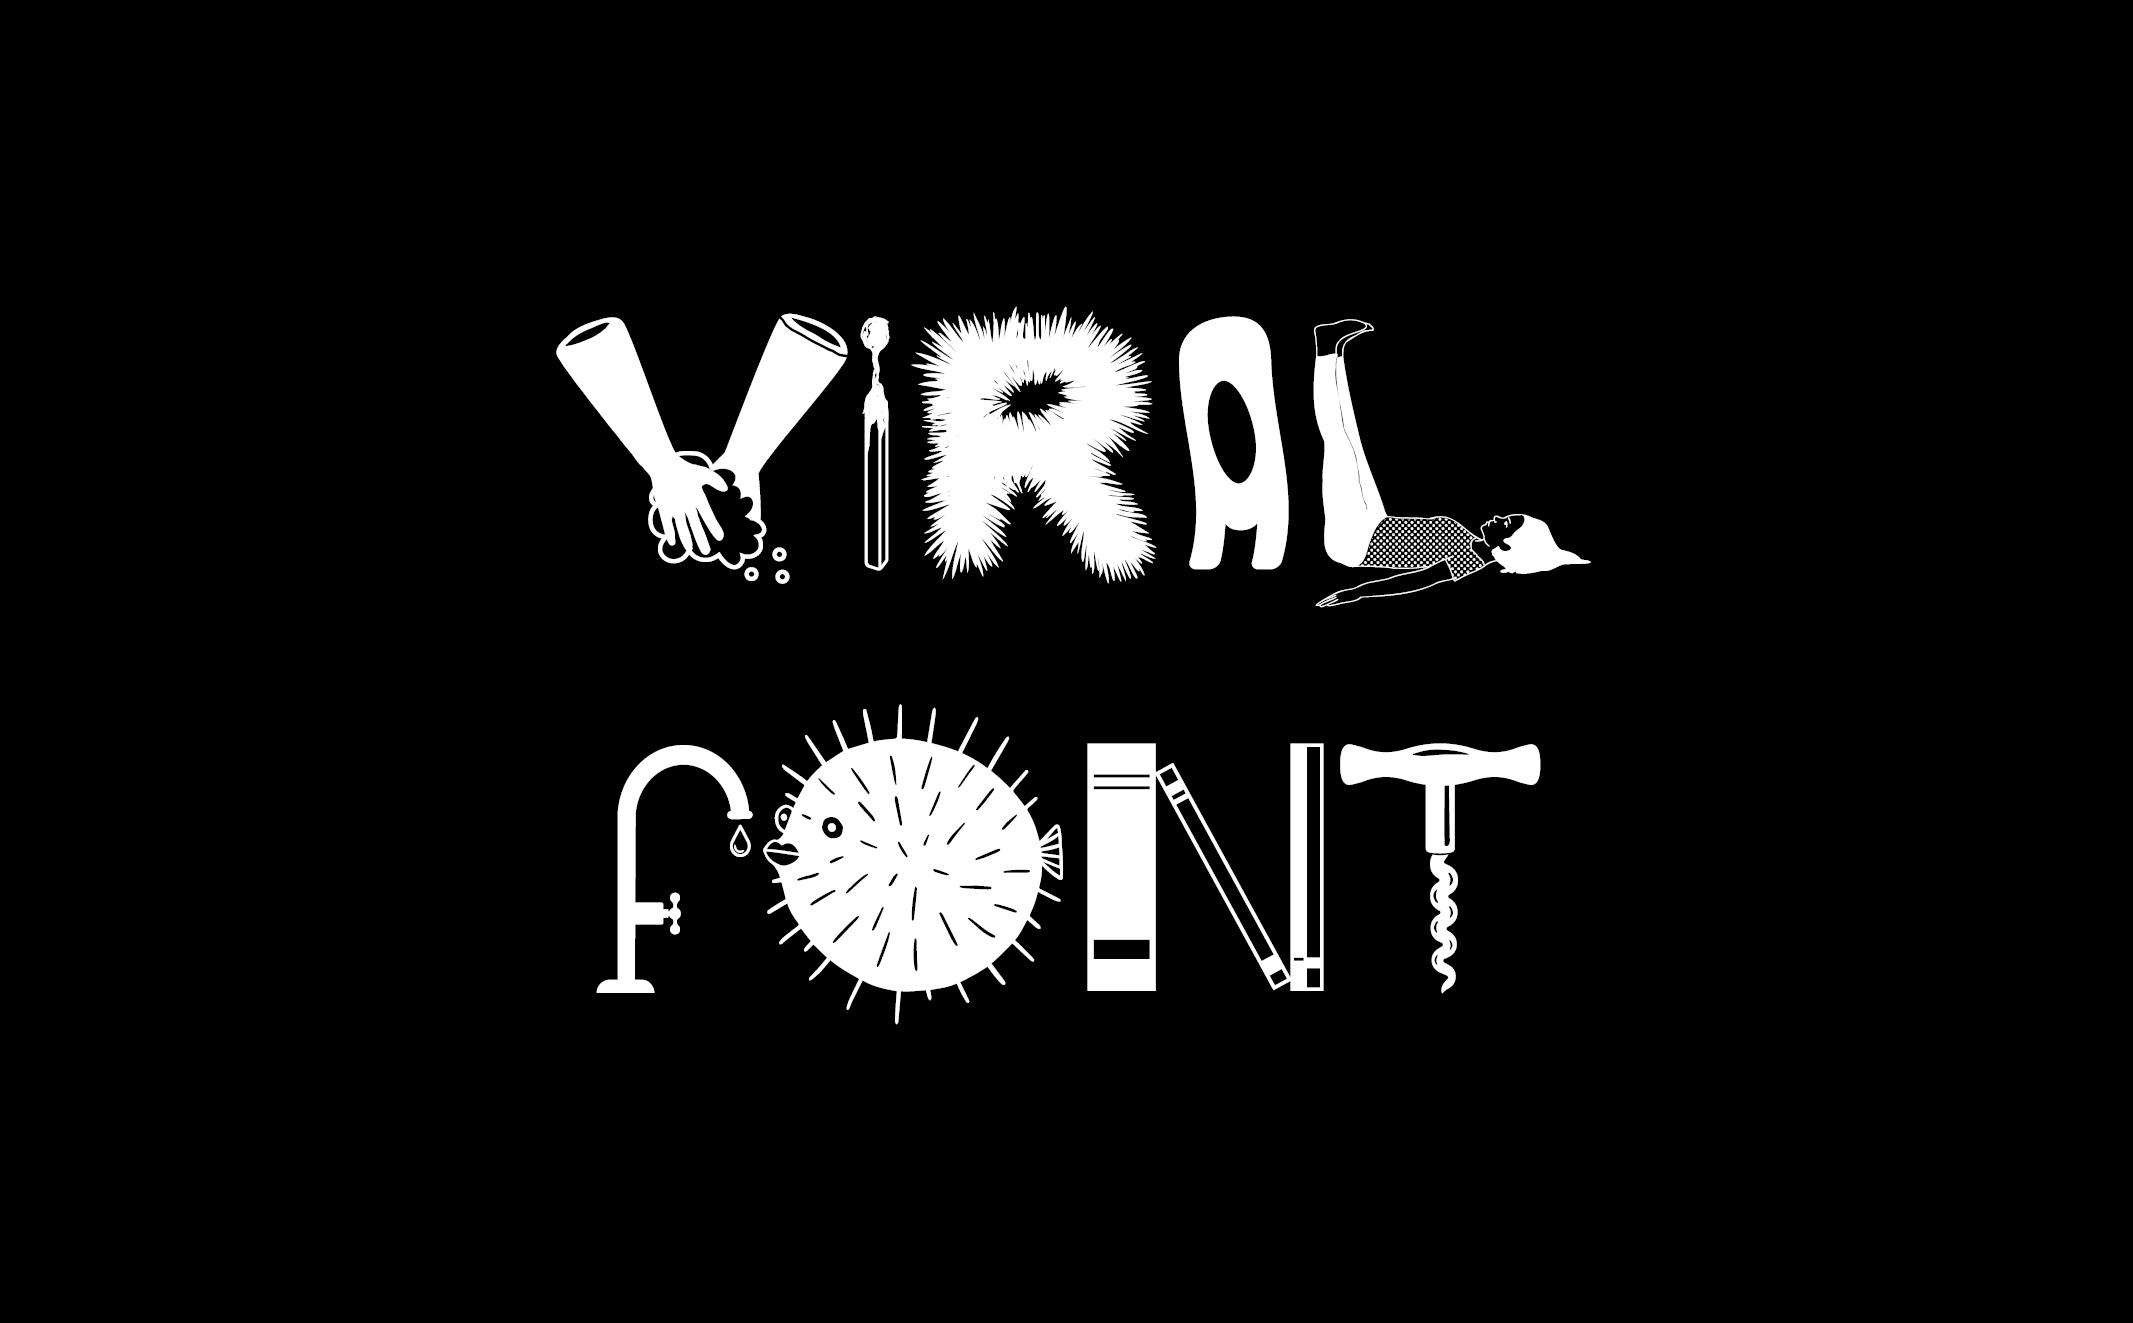 Viral Font